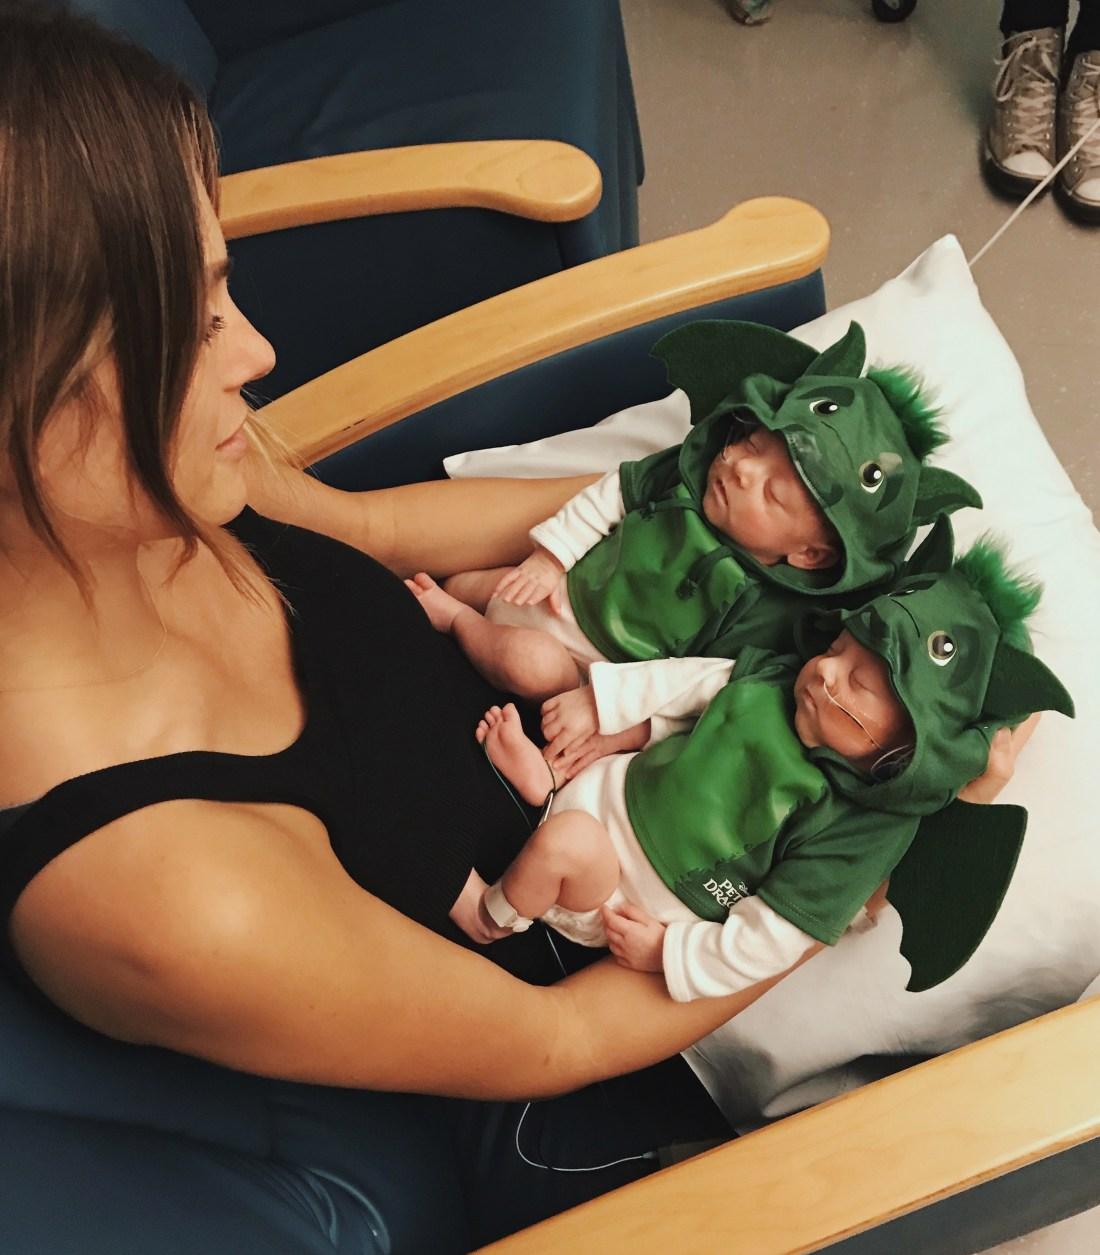 NICU Halloween Costume | Halloween Costume for Preemie Baby